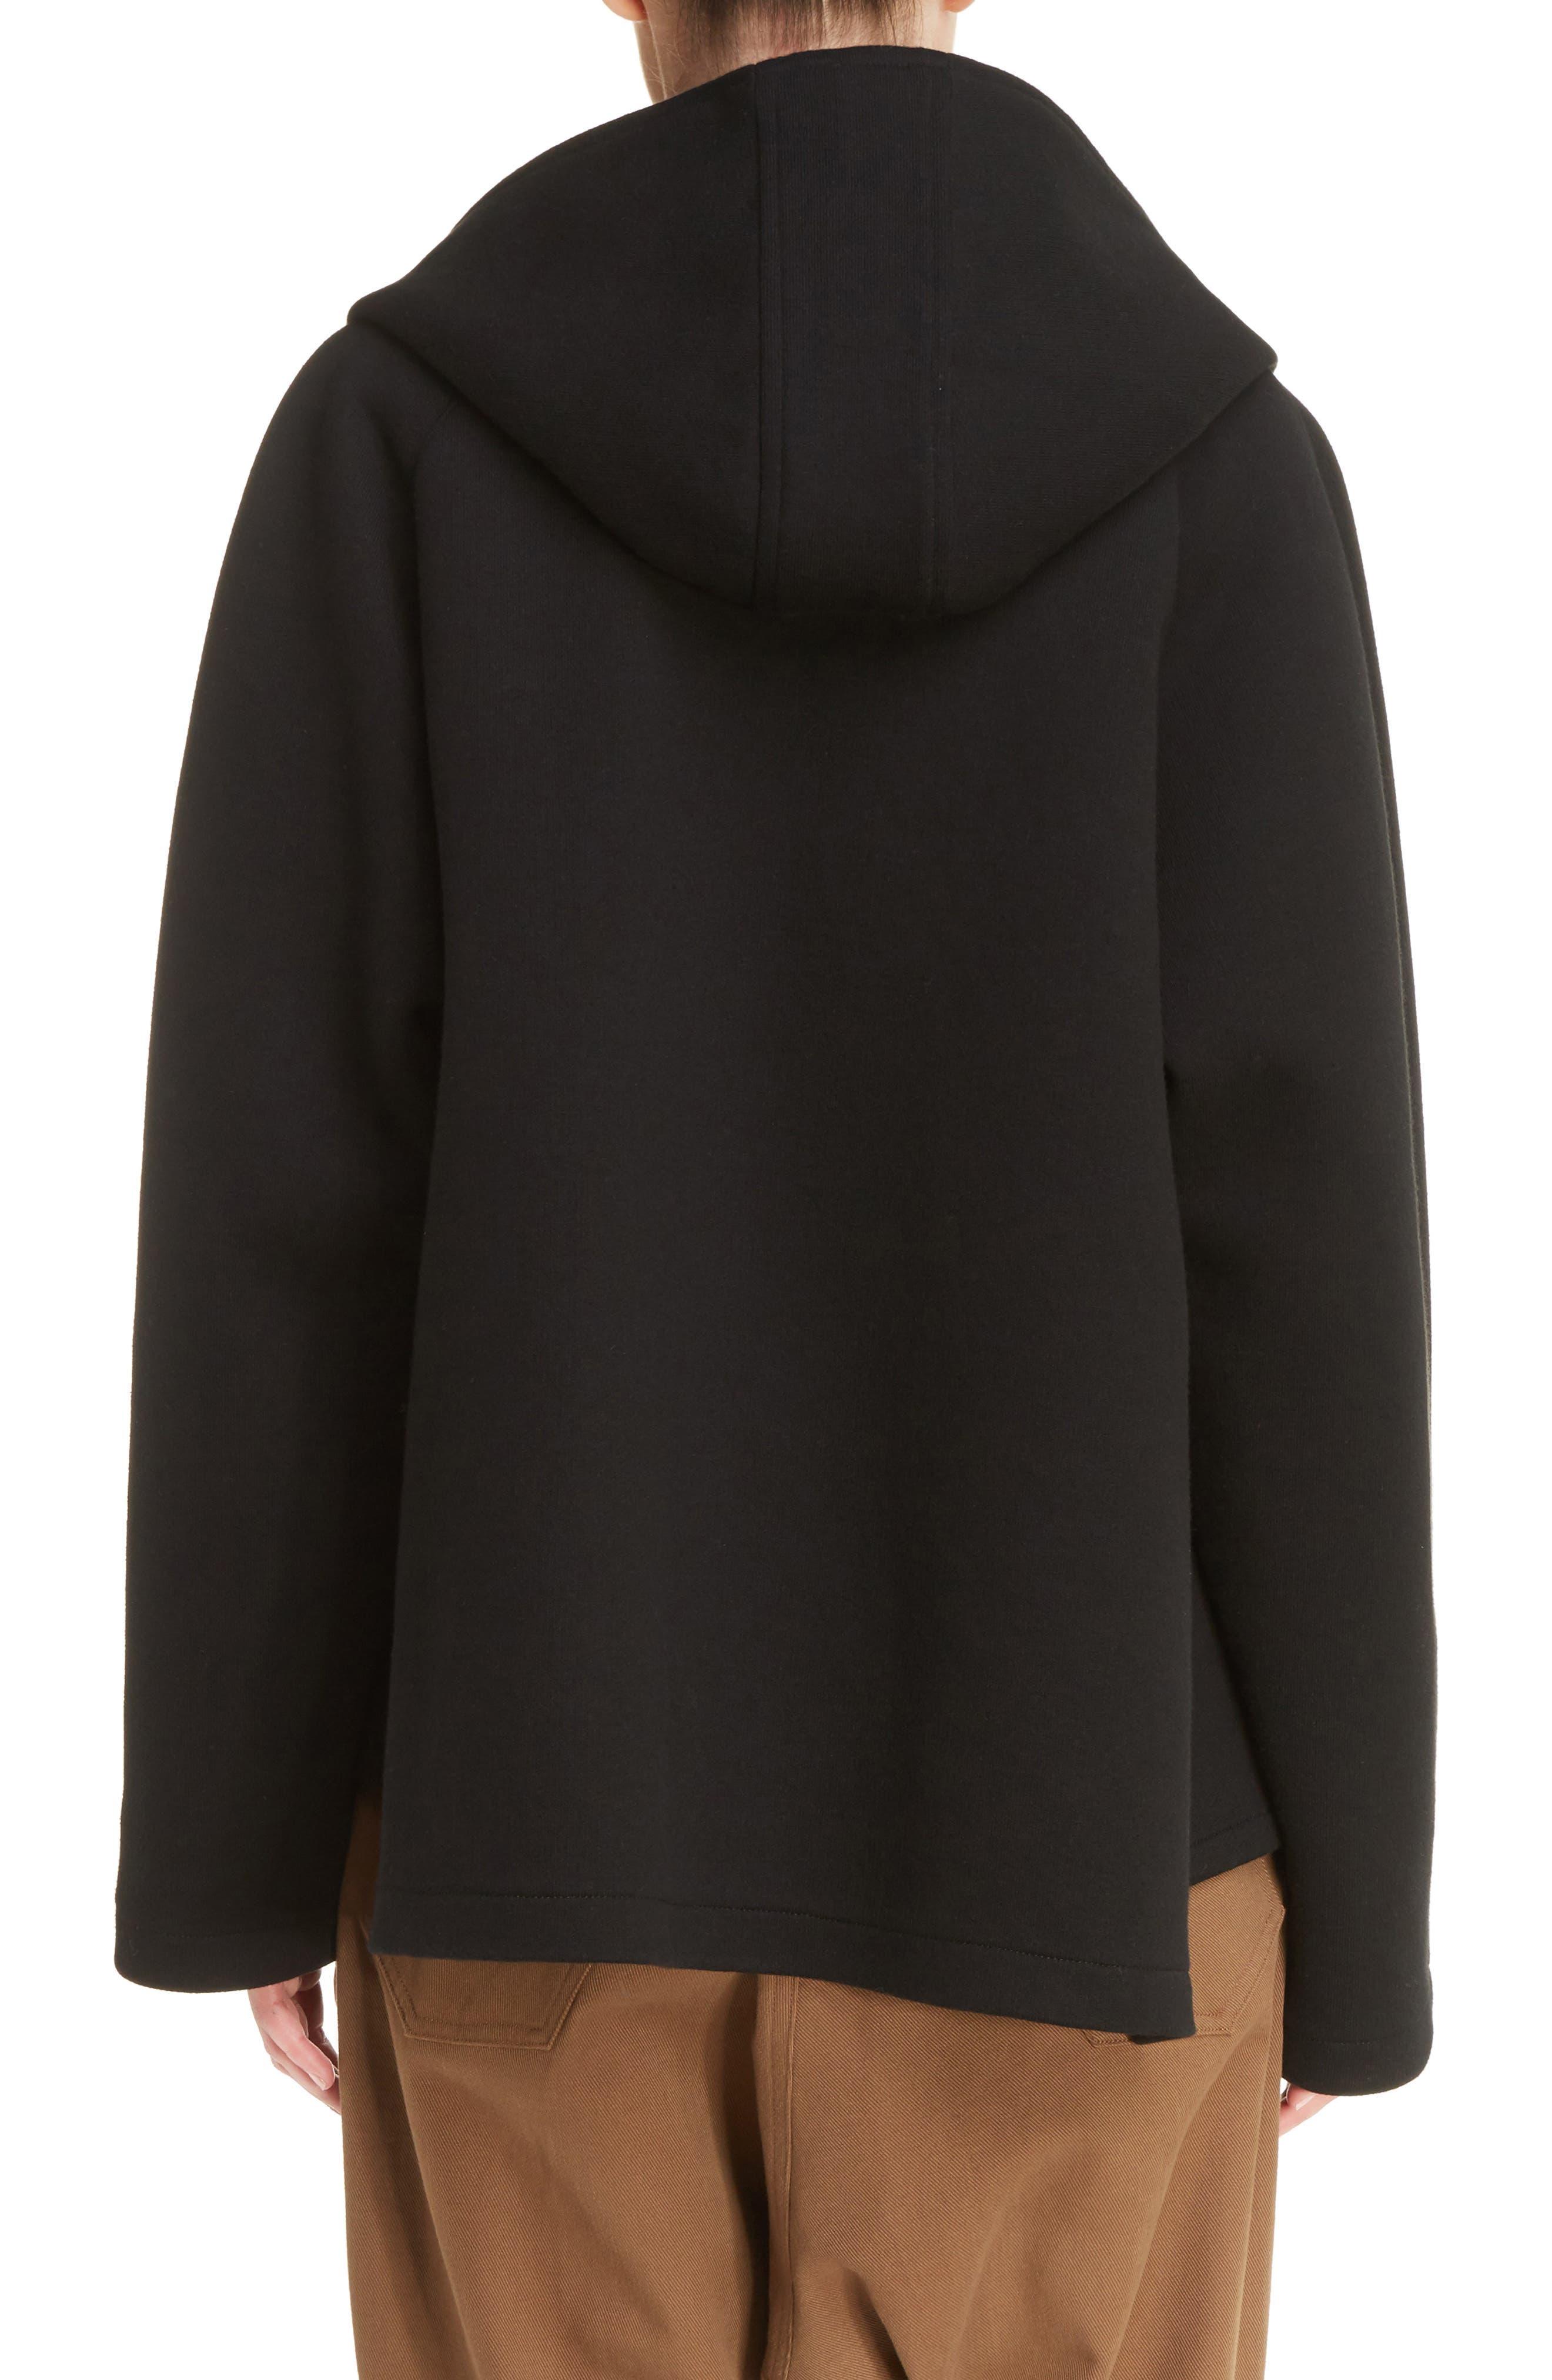 U-Hood Short Jacket,                             Alternate thumbnail 2, color,                             020